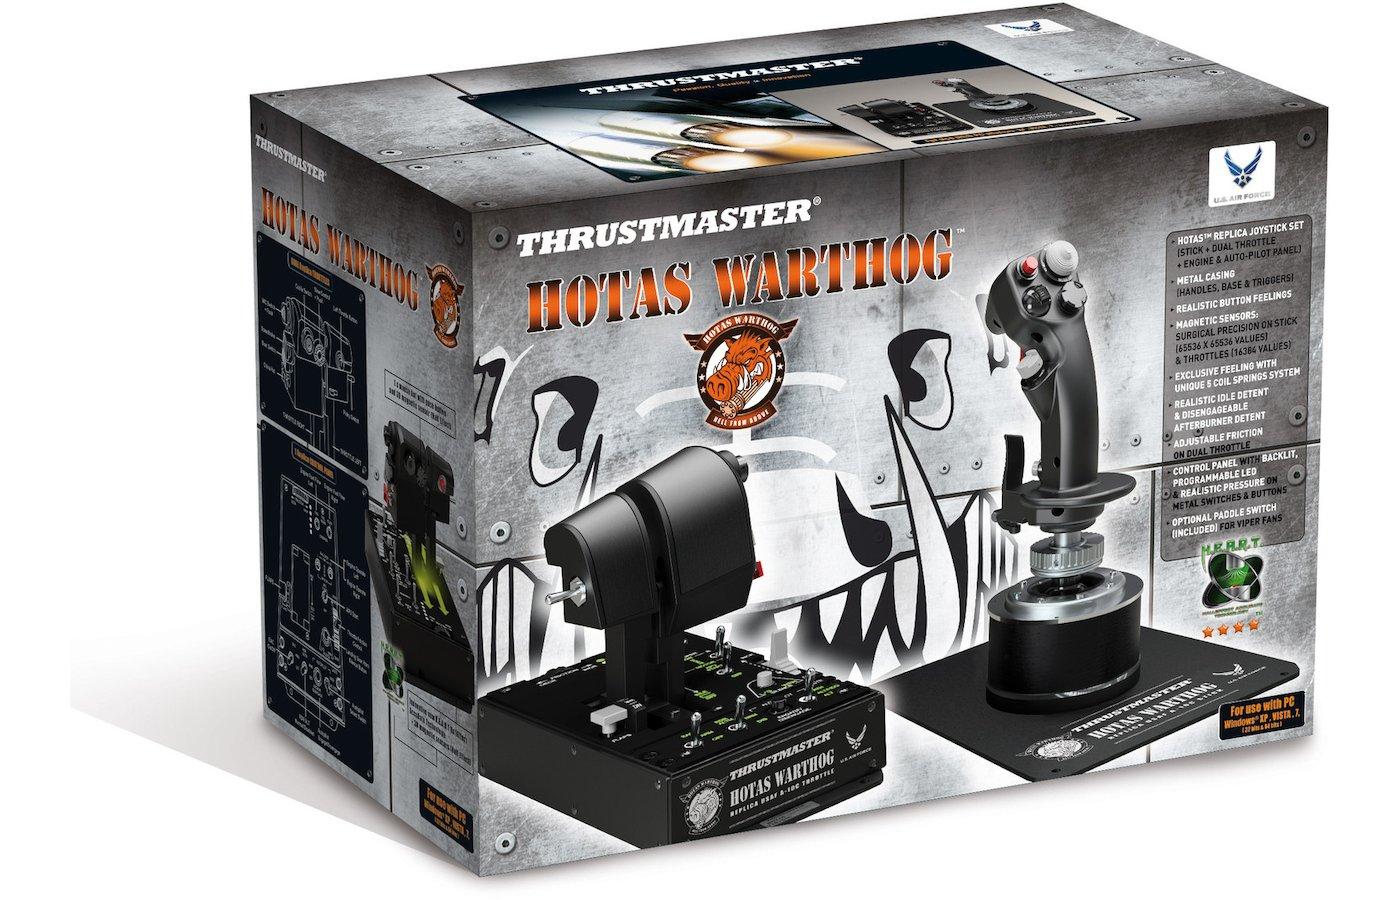 Thrustmaster Hotas Warthog (2960720)